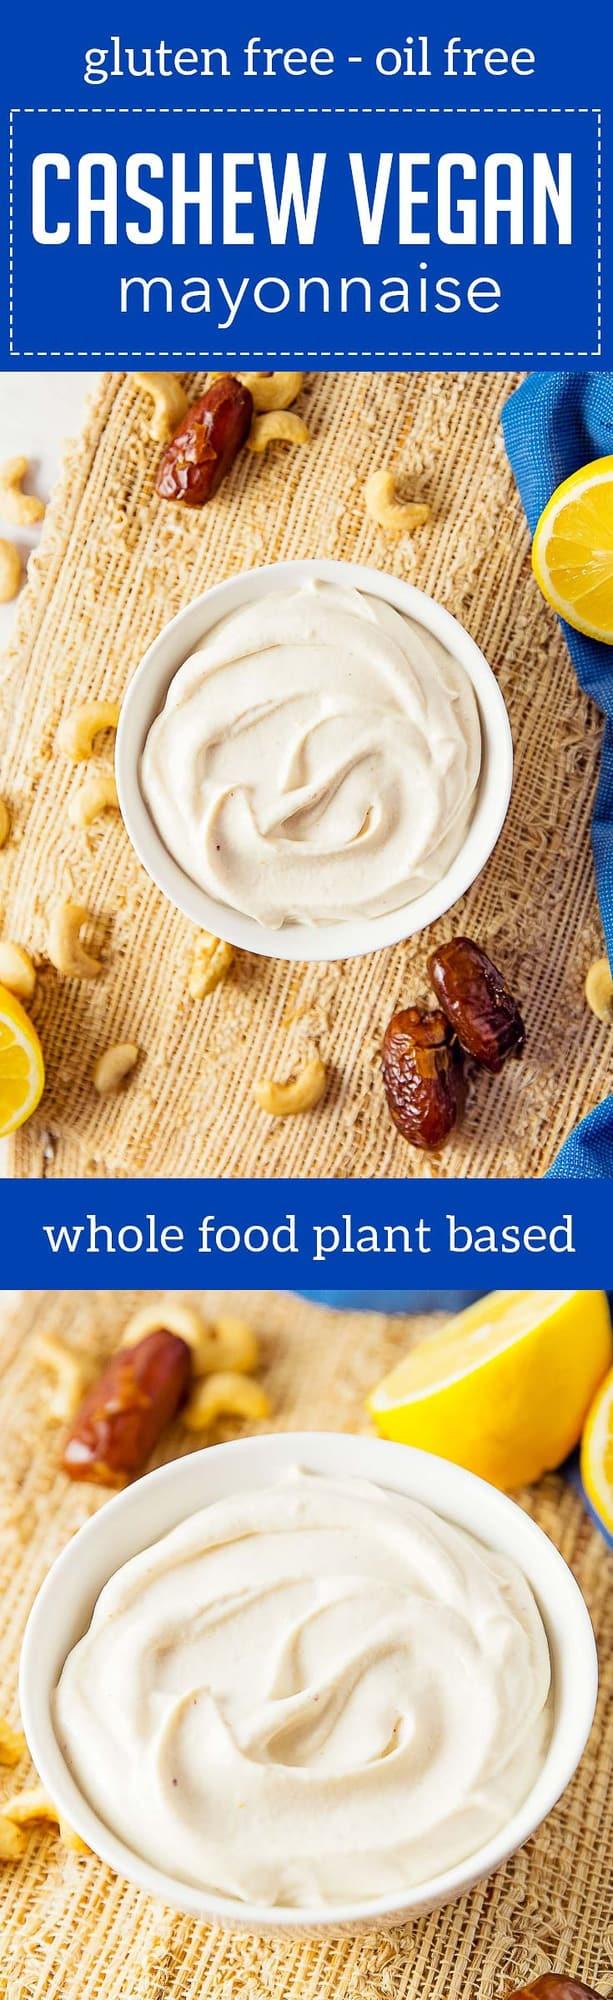 Cashew Vegan Mayonnaise, vegan, vegetarian, whole food plant based, gluten free, recipe, wfpb, healthy, oil free, no refined sugar, no oil, refined sugar free, dinner, side, side dish, dairy free